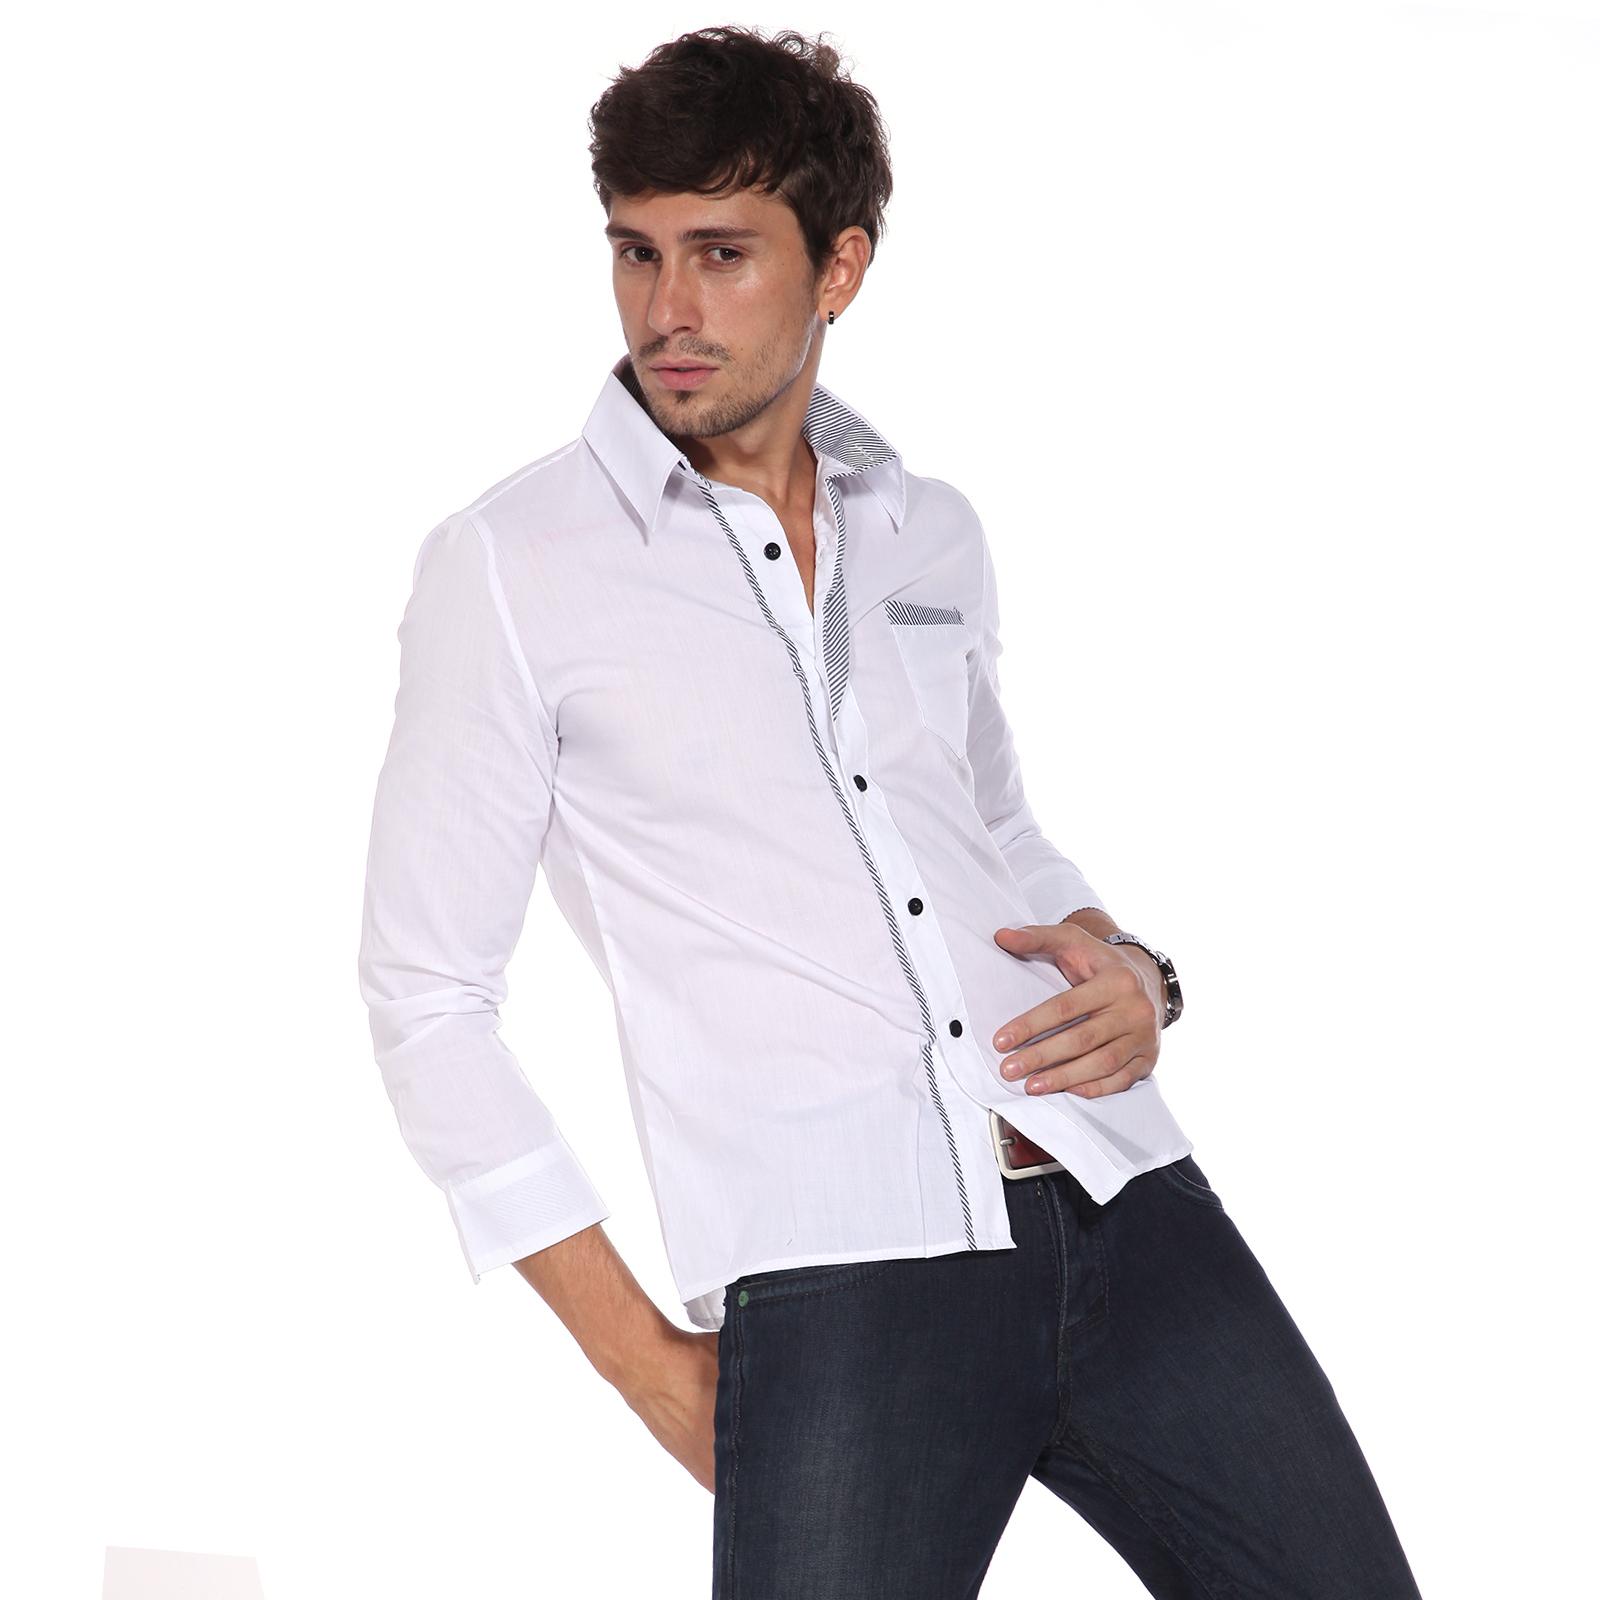 chemise homme slim veste jean costume garcon shirt raye t. Black Bedroom Furniture Sets. Home Design Ideas